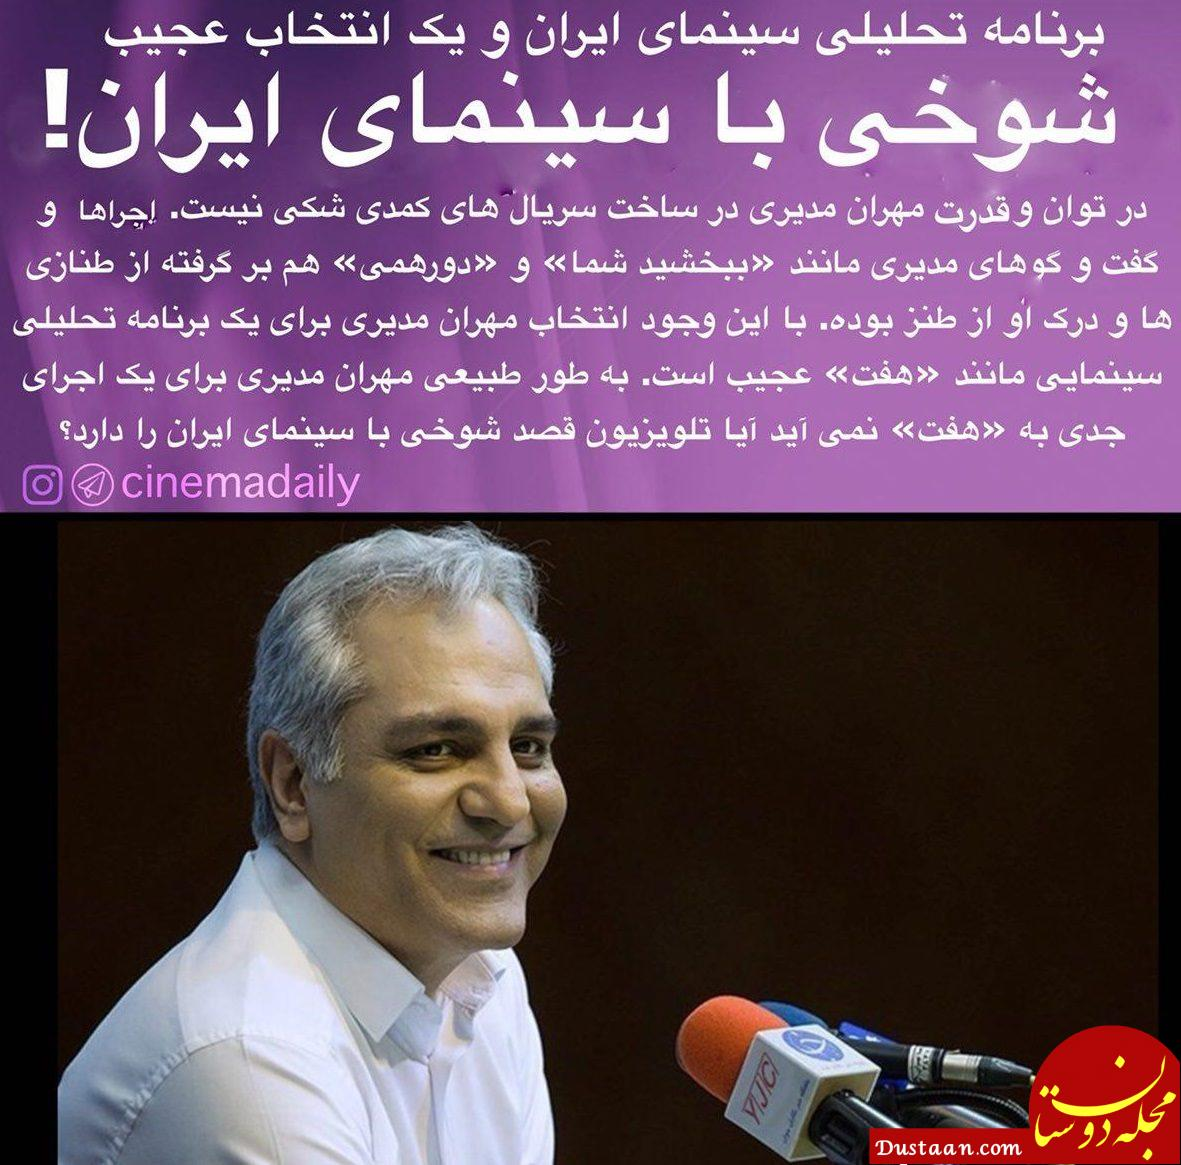 www.dustaan.com برنامه «هفت» امسال؛ شوخی با سینمای ایران؟!